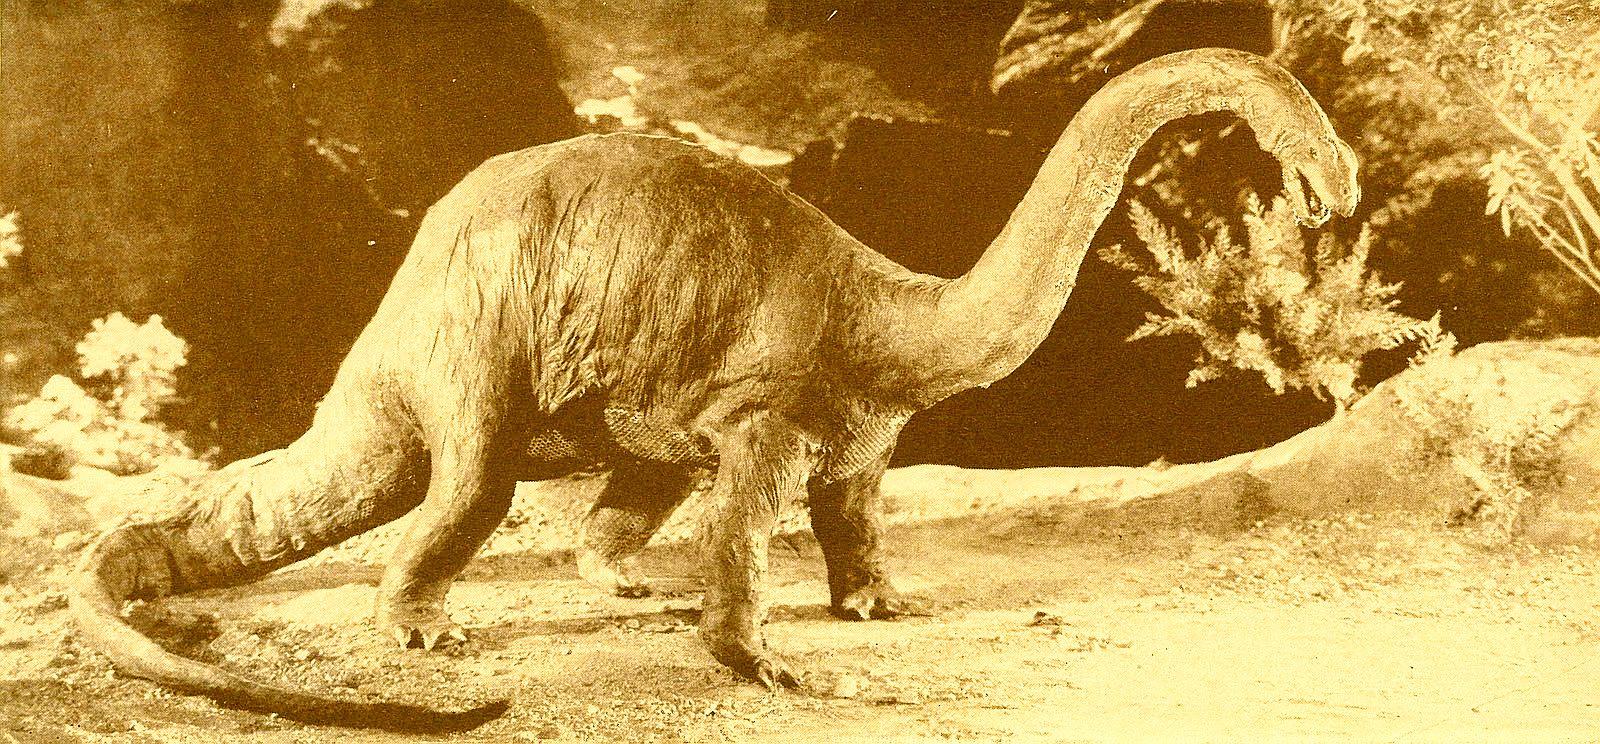 brontosaurus_1925_02.jpg